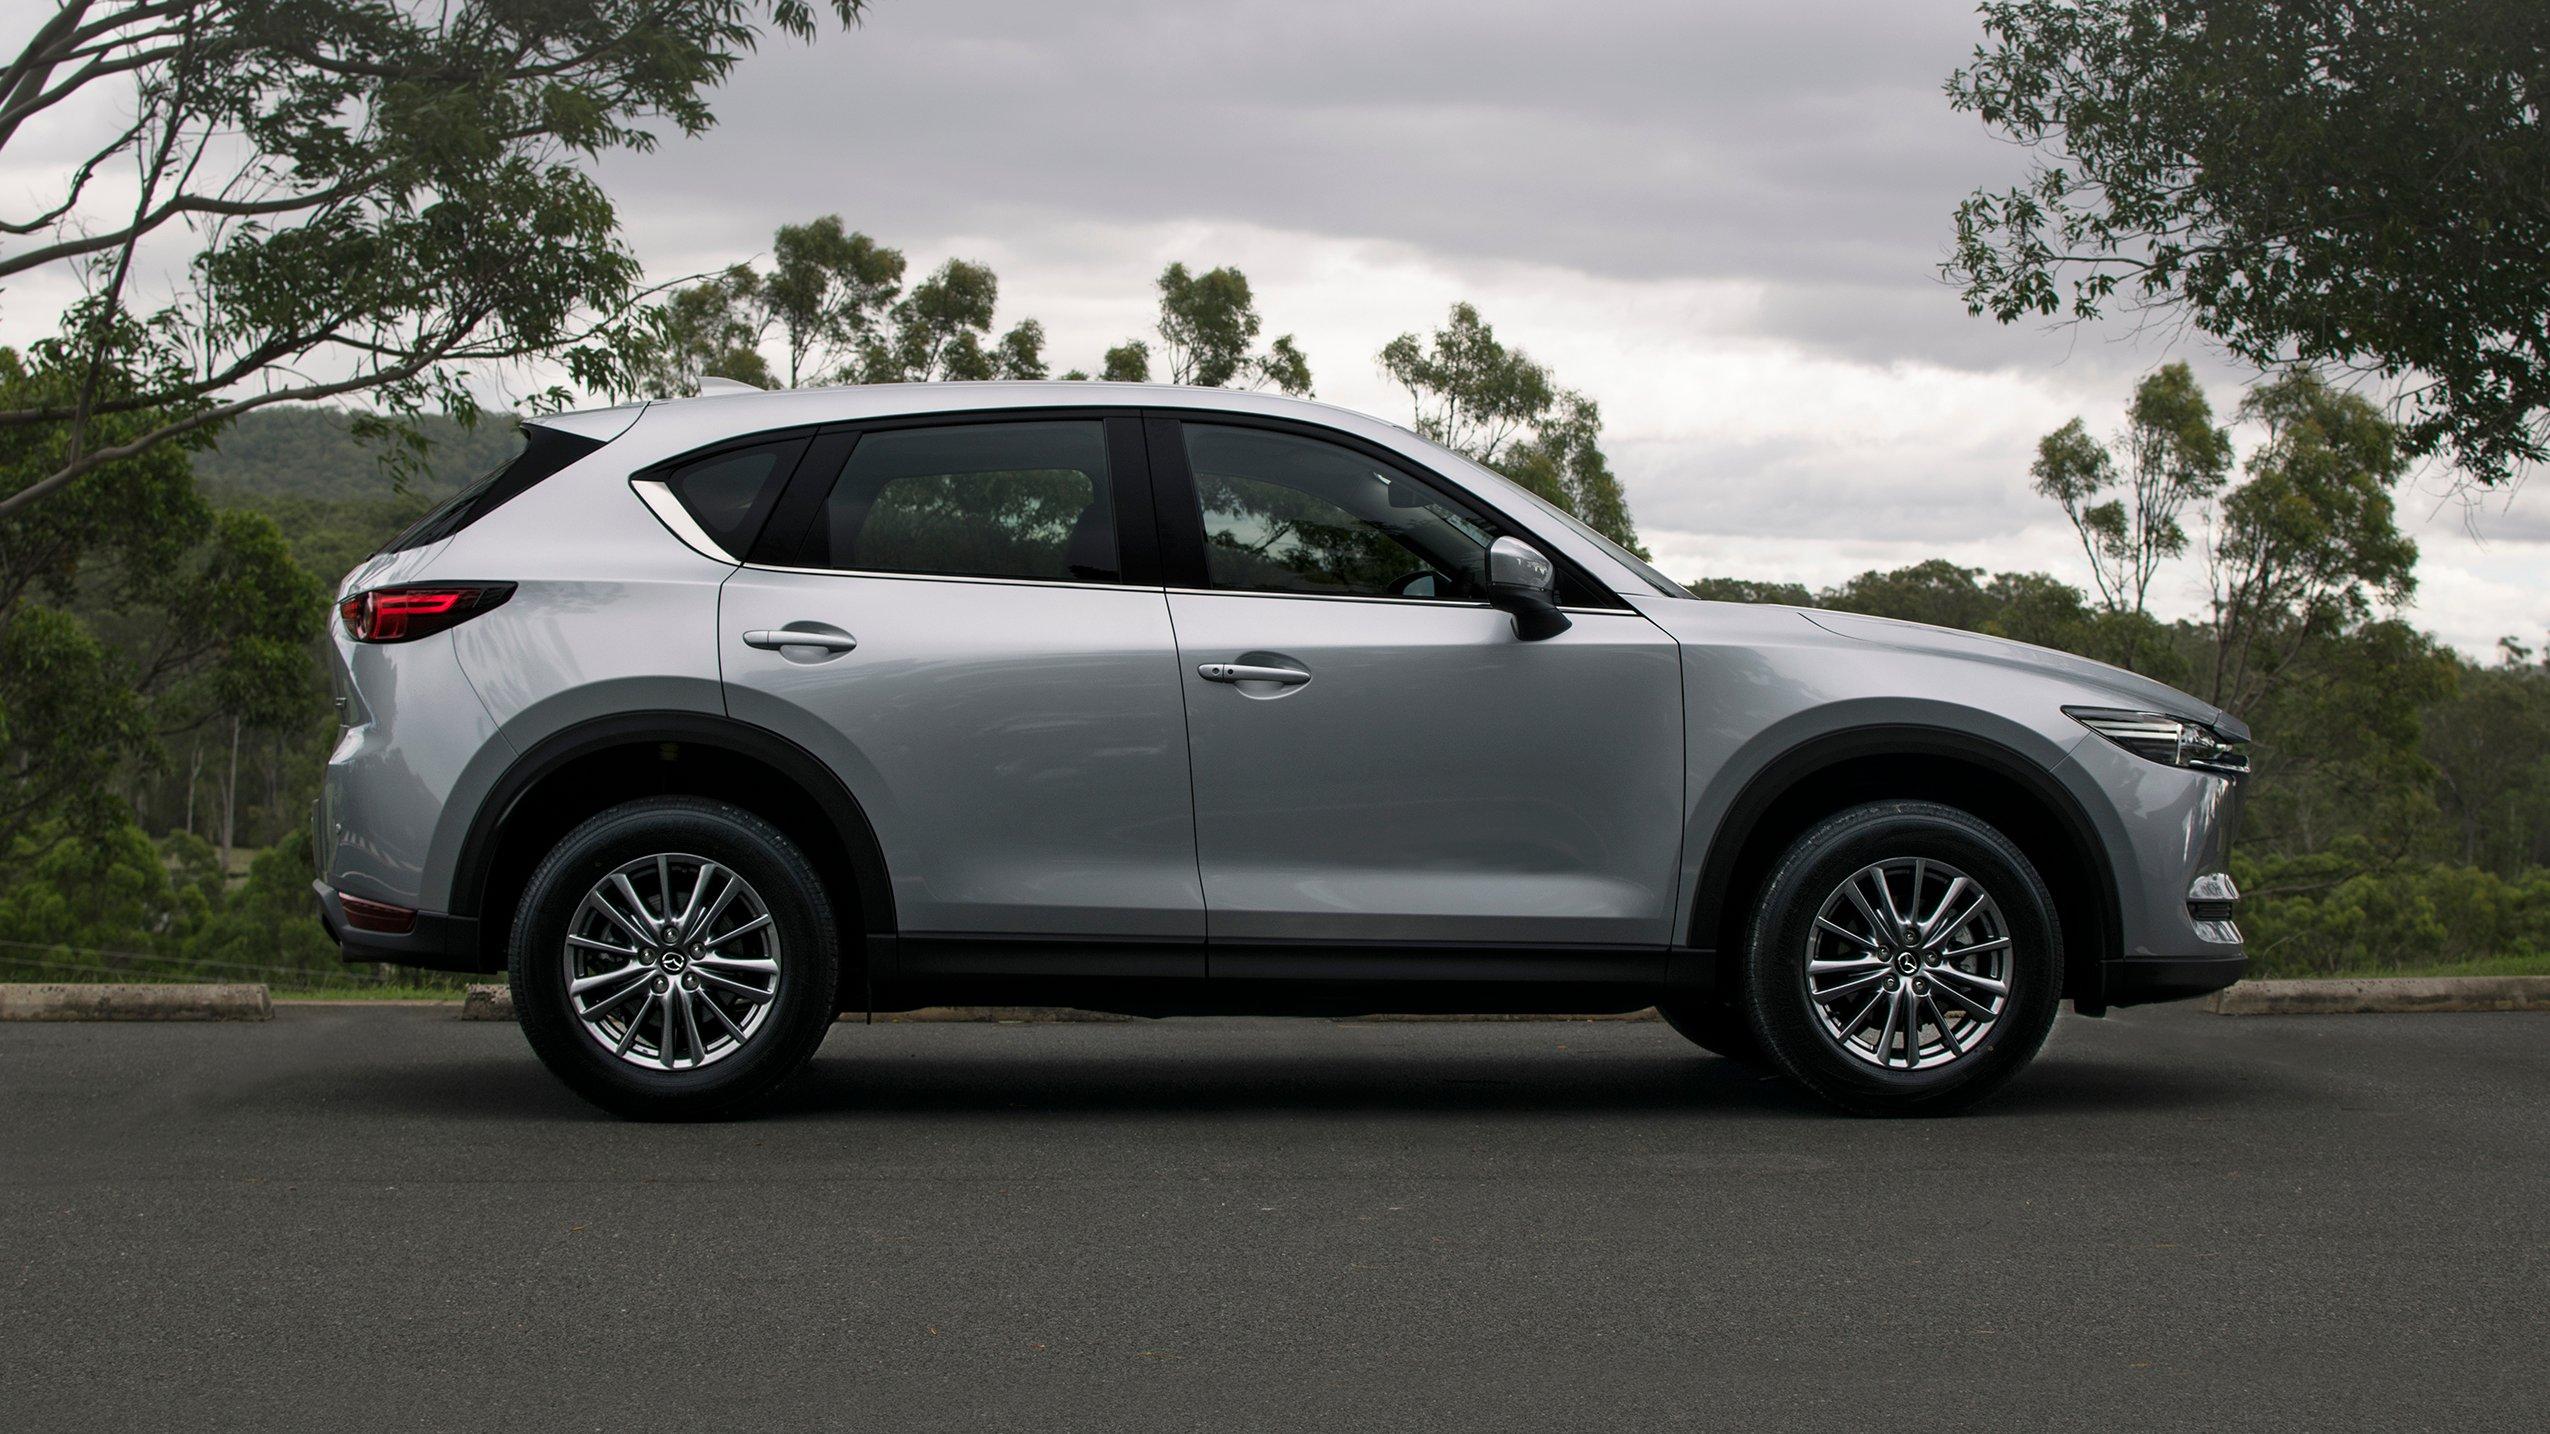 2017 Mazda CX-5 Touring petrol review | CarAdvice